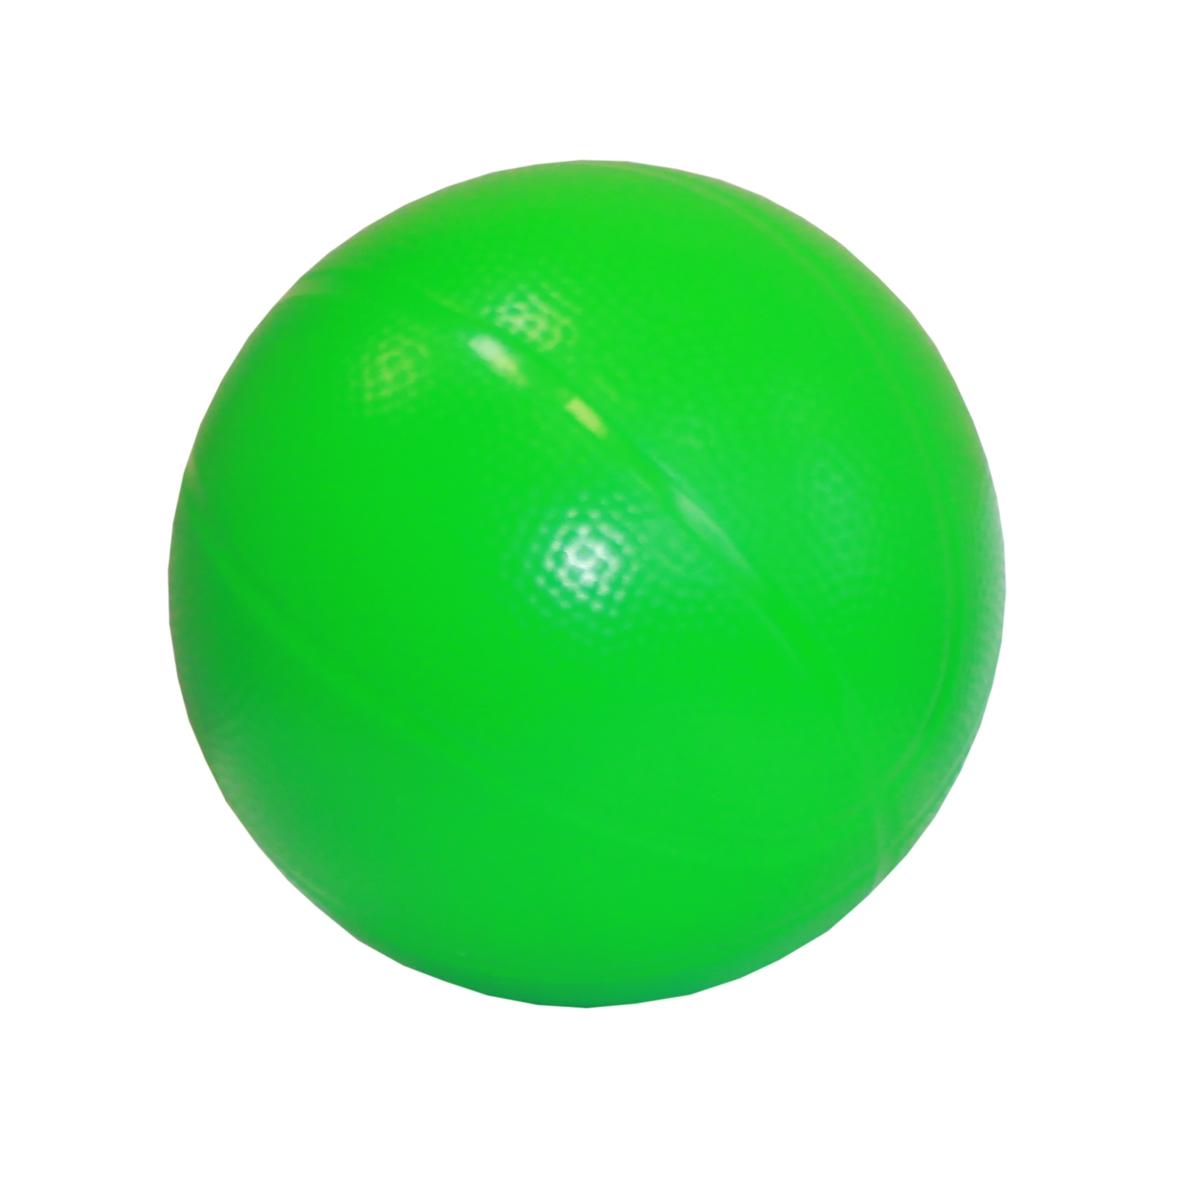 Пластмастер Мяч Neo диаметр 12,5 см